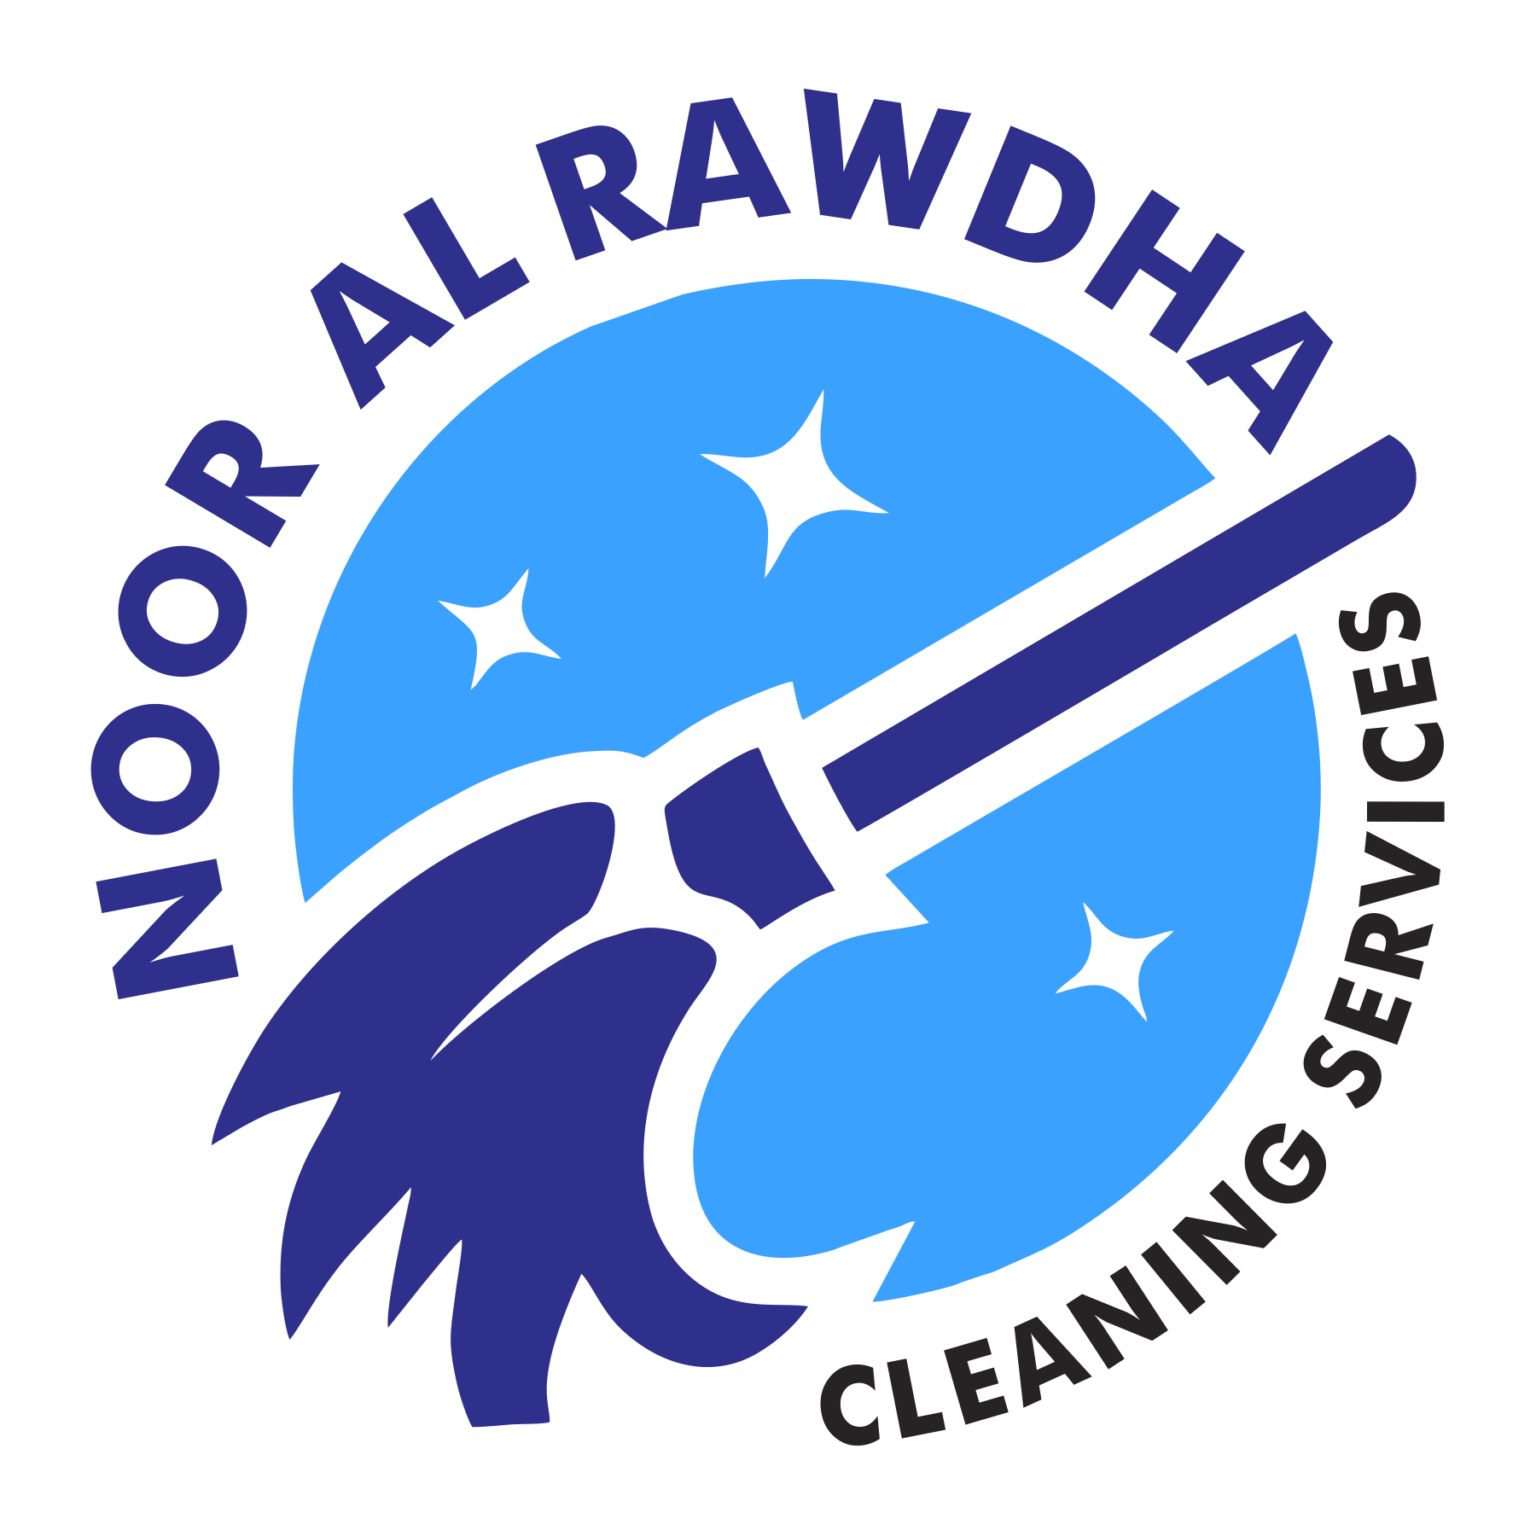 Al-Rawdha-transparent-1536x1536.png